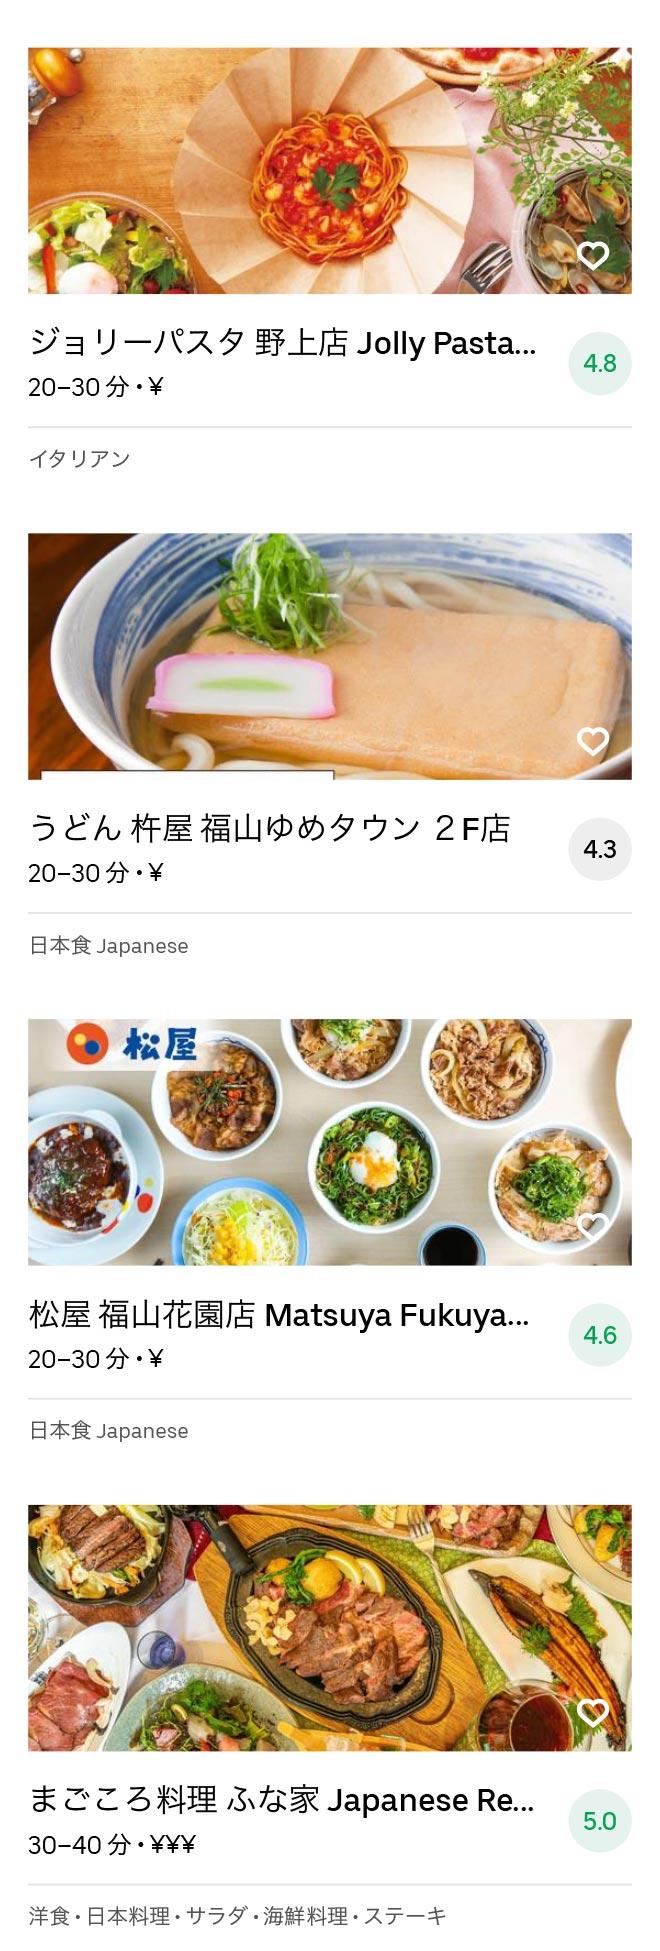 Fukuyama menu 2010 05